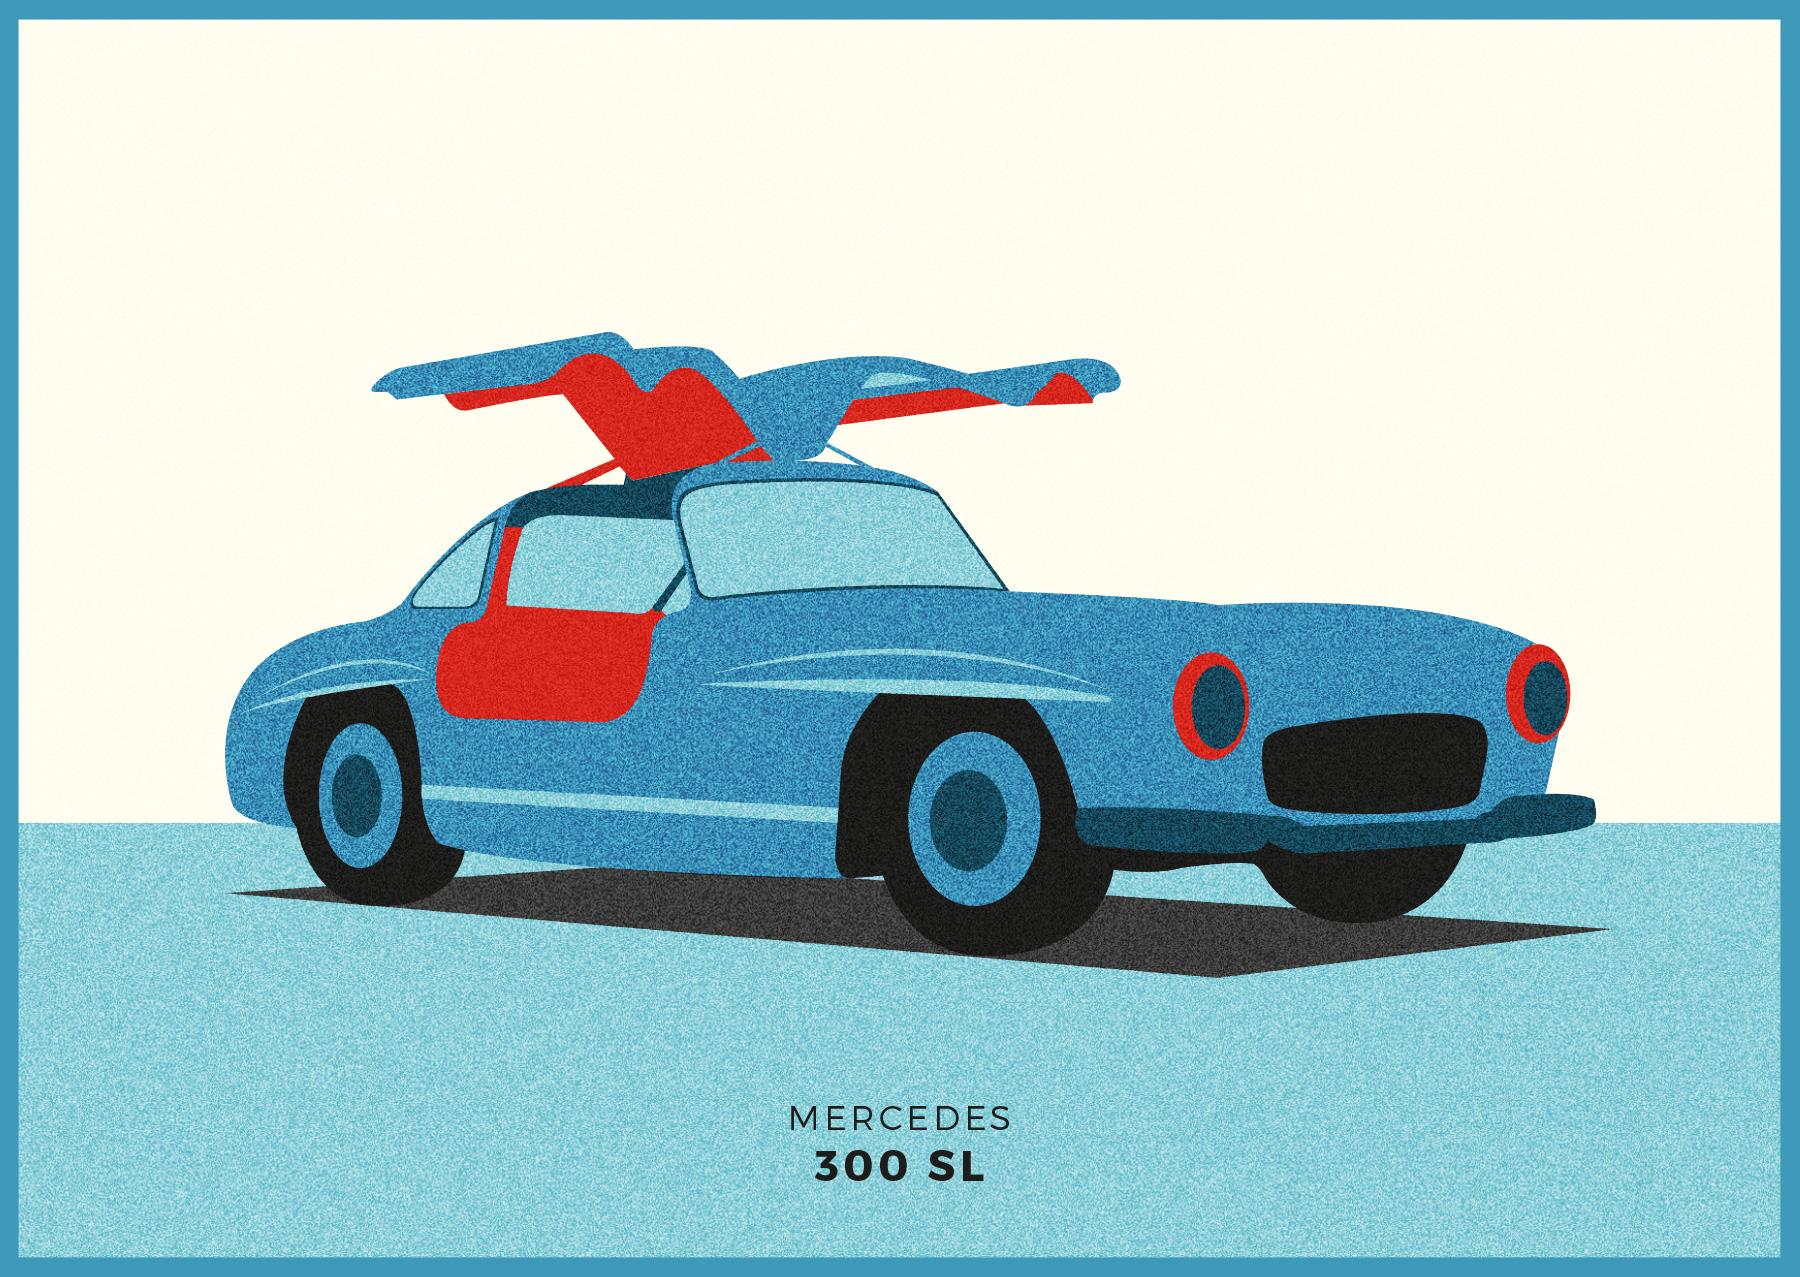 Carole_Chevalier-Iconic-cars-4.jpg